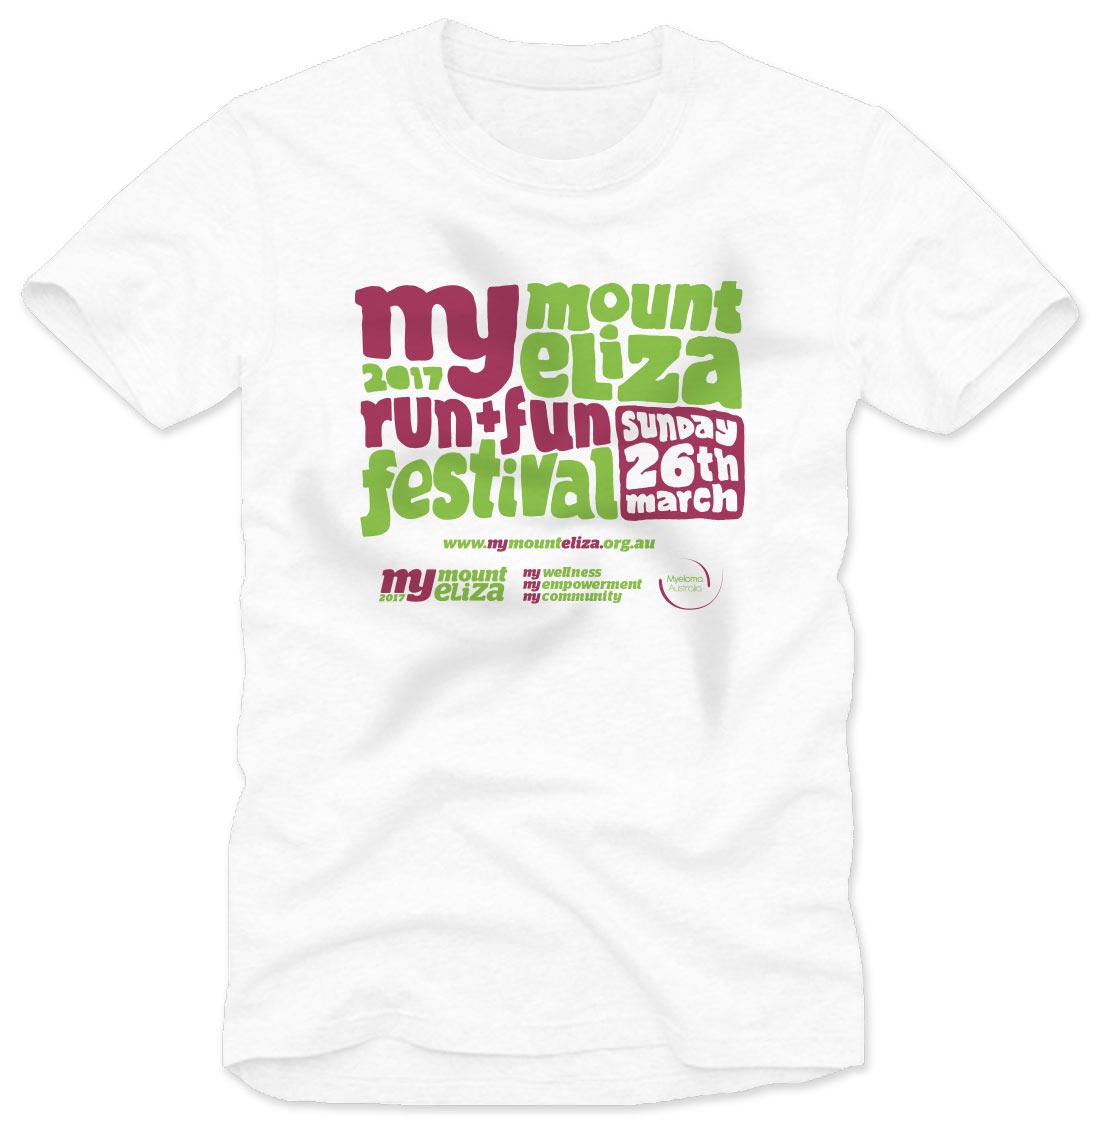 Official festival t-shirt